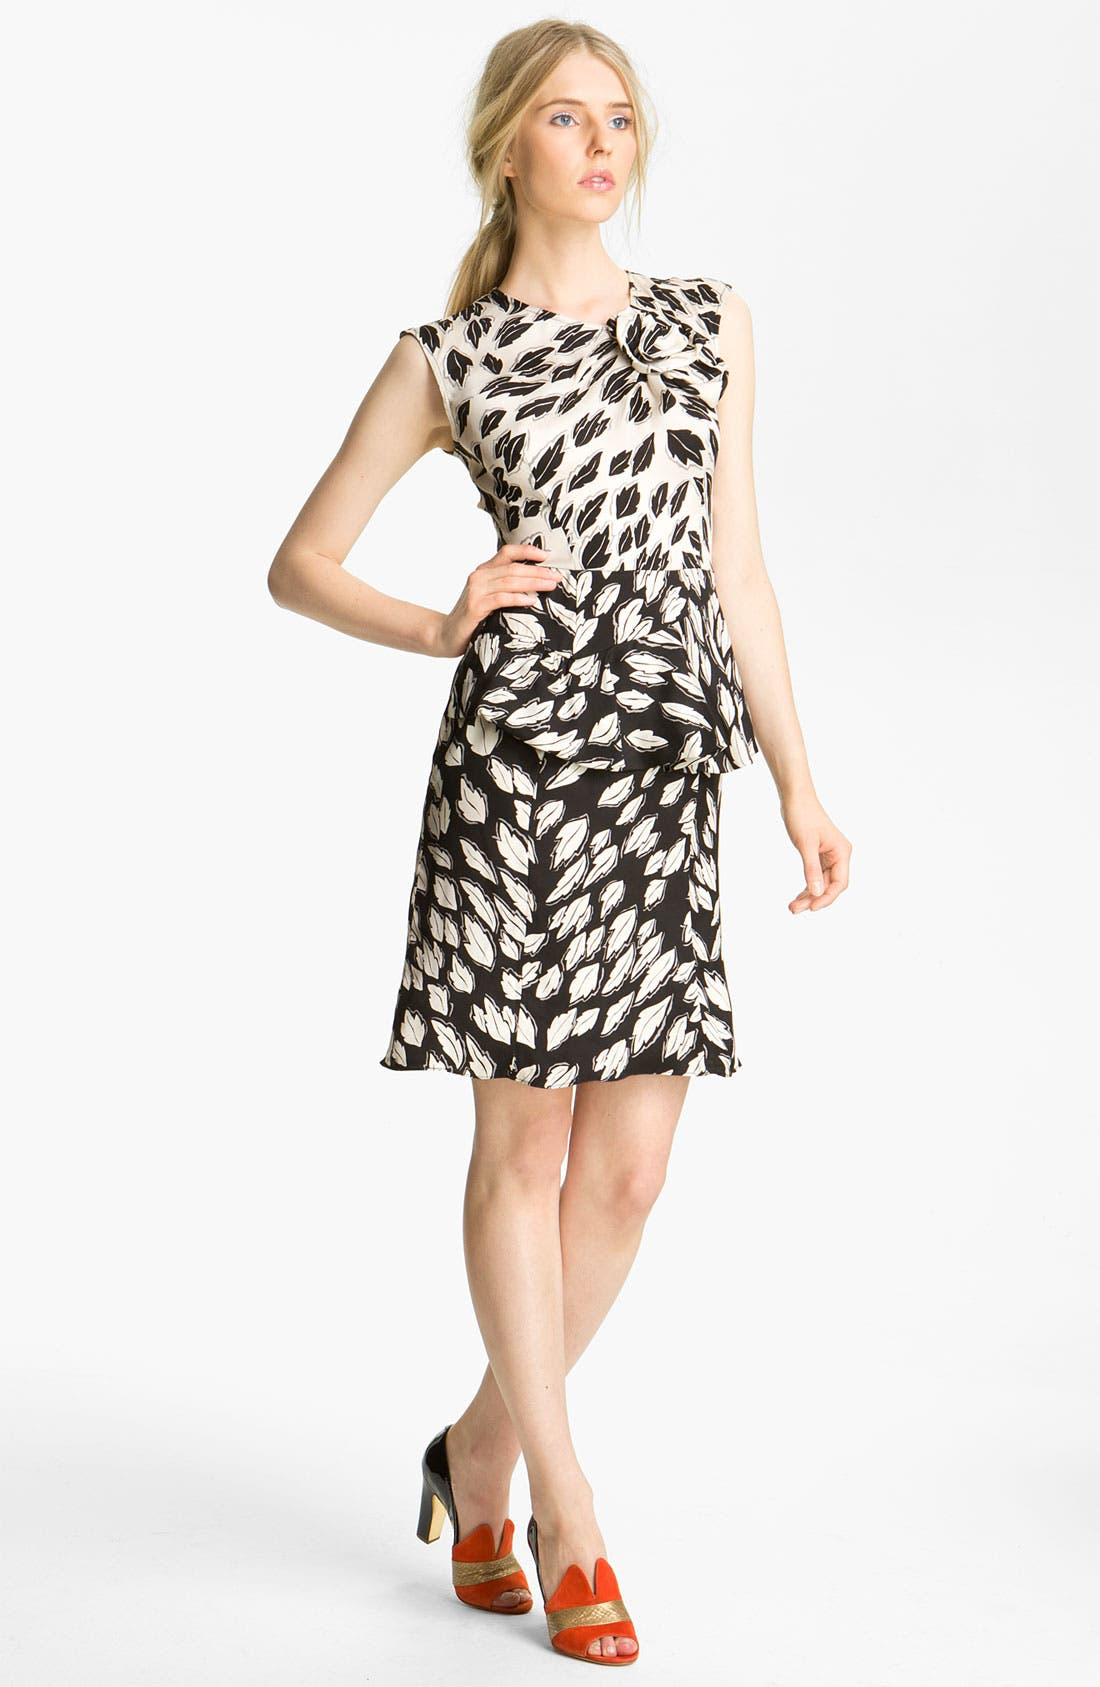 Alternate Image 1 Selected - Tracy Reese 'Falling Leaves' Peplum Dress